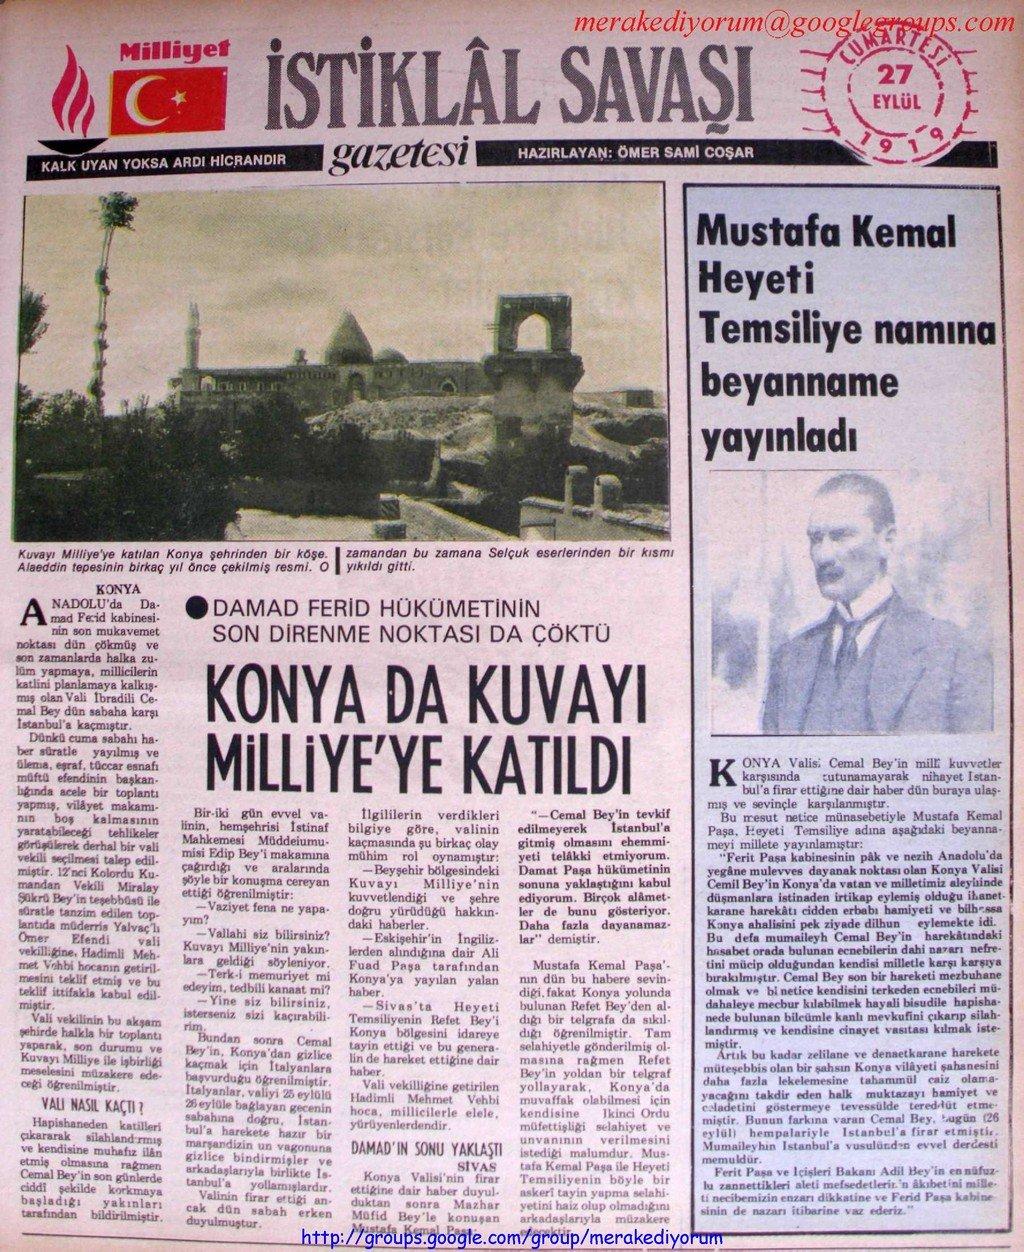 istiklal savaşı gazetesi - 27 eylül 1919